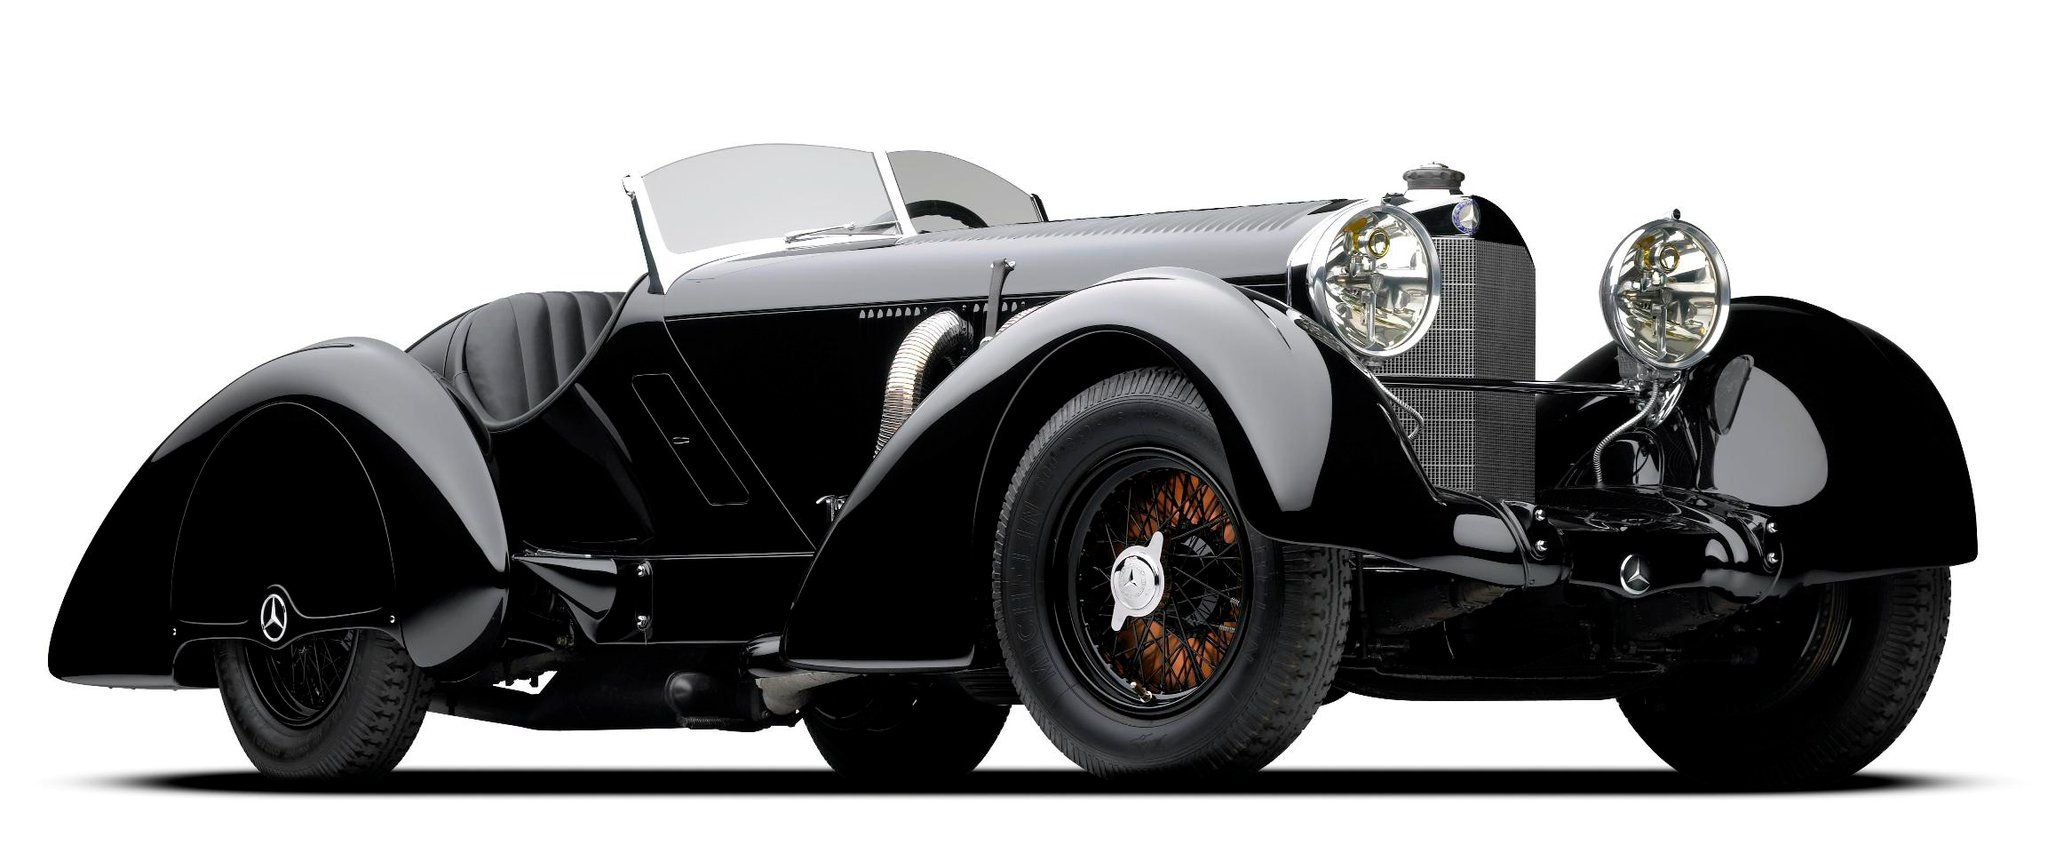 1930 mercedes ssk count trossi